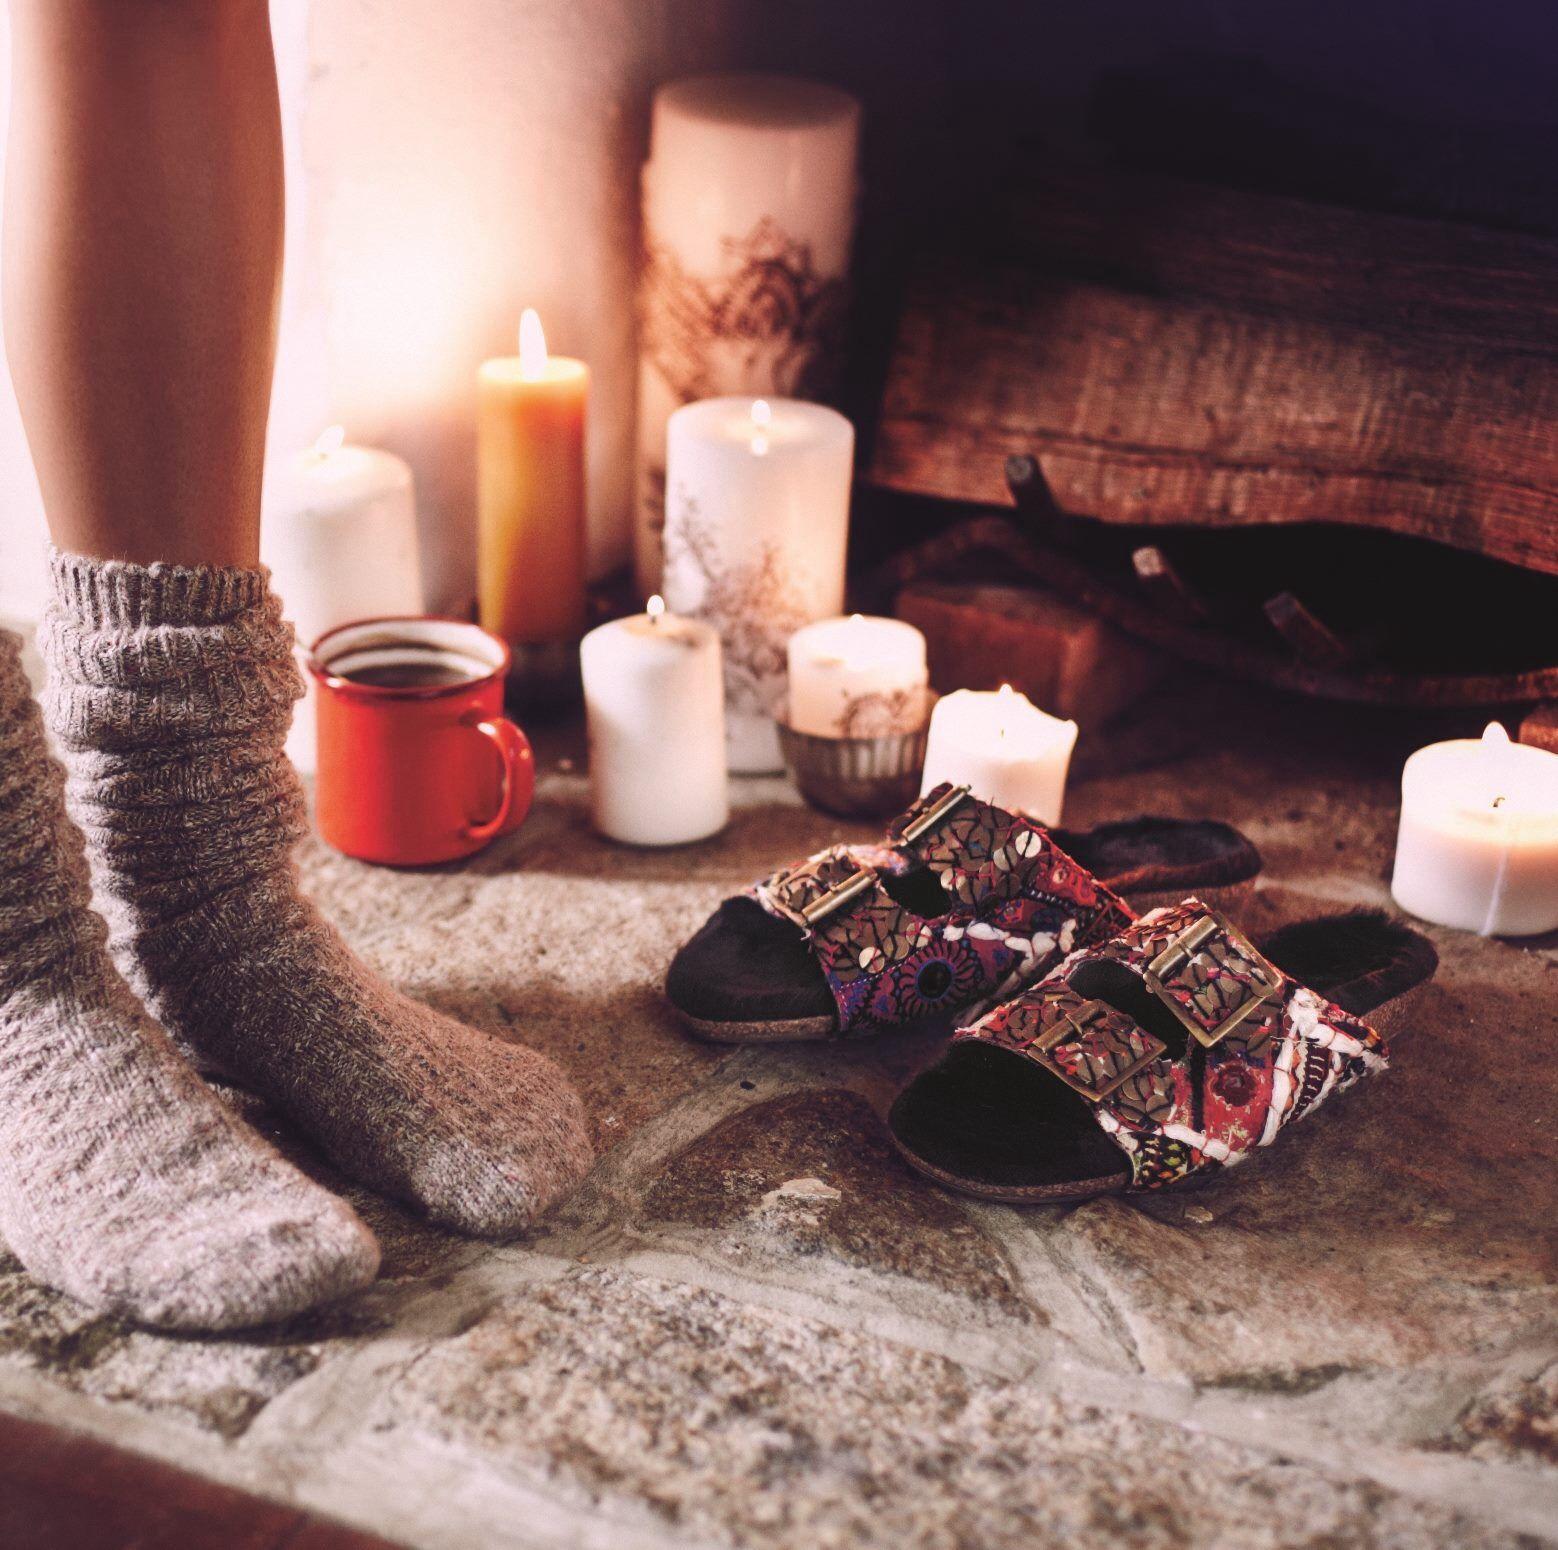 Cozy Winter Socks #Zappos #Keepingwarm #Socksandslippers